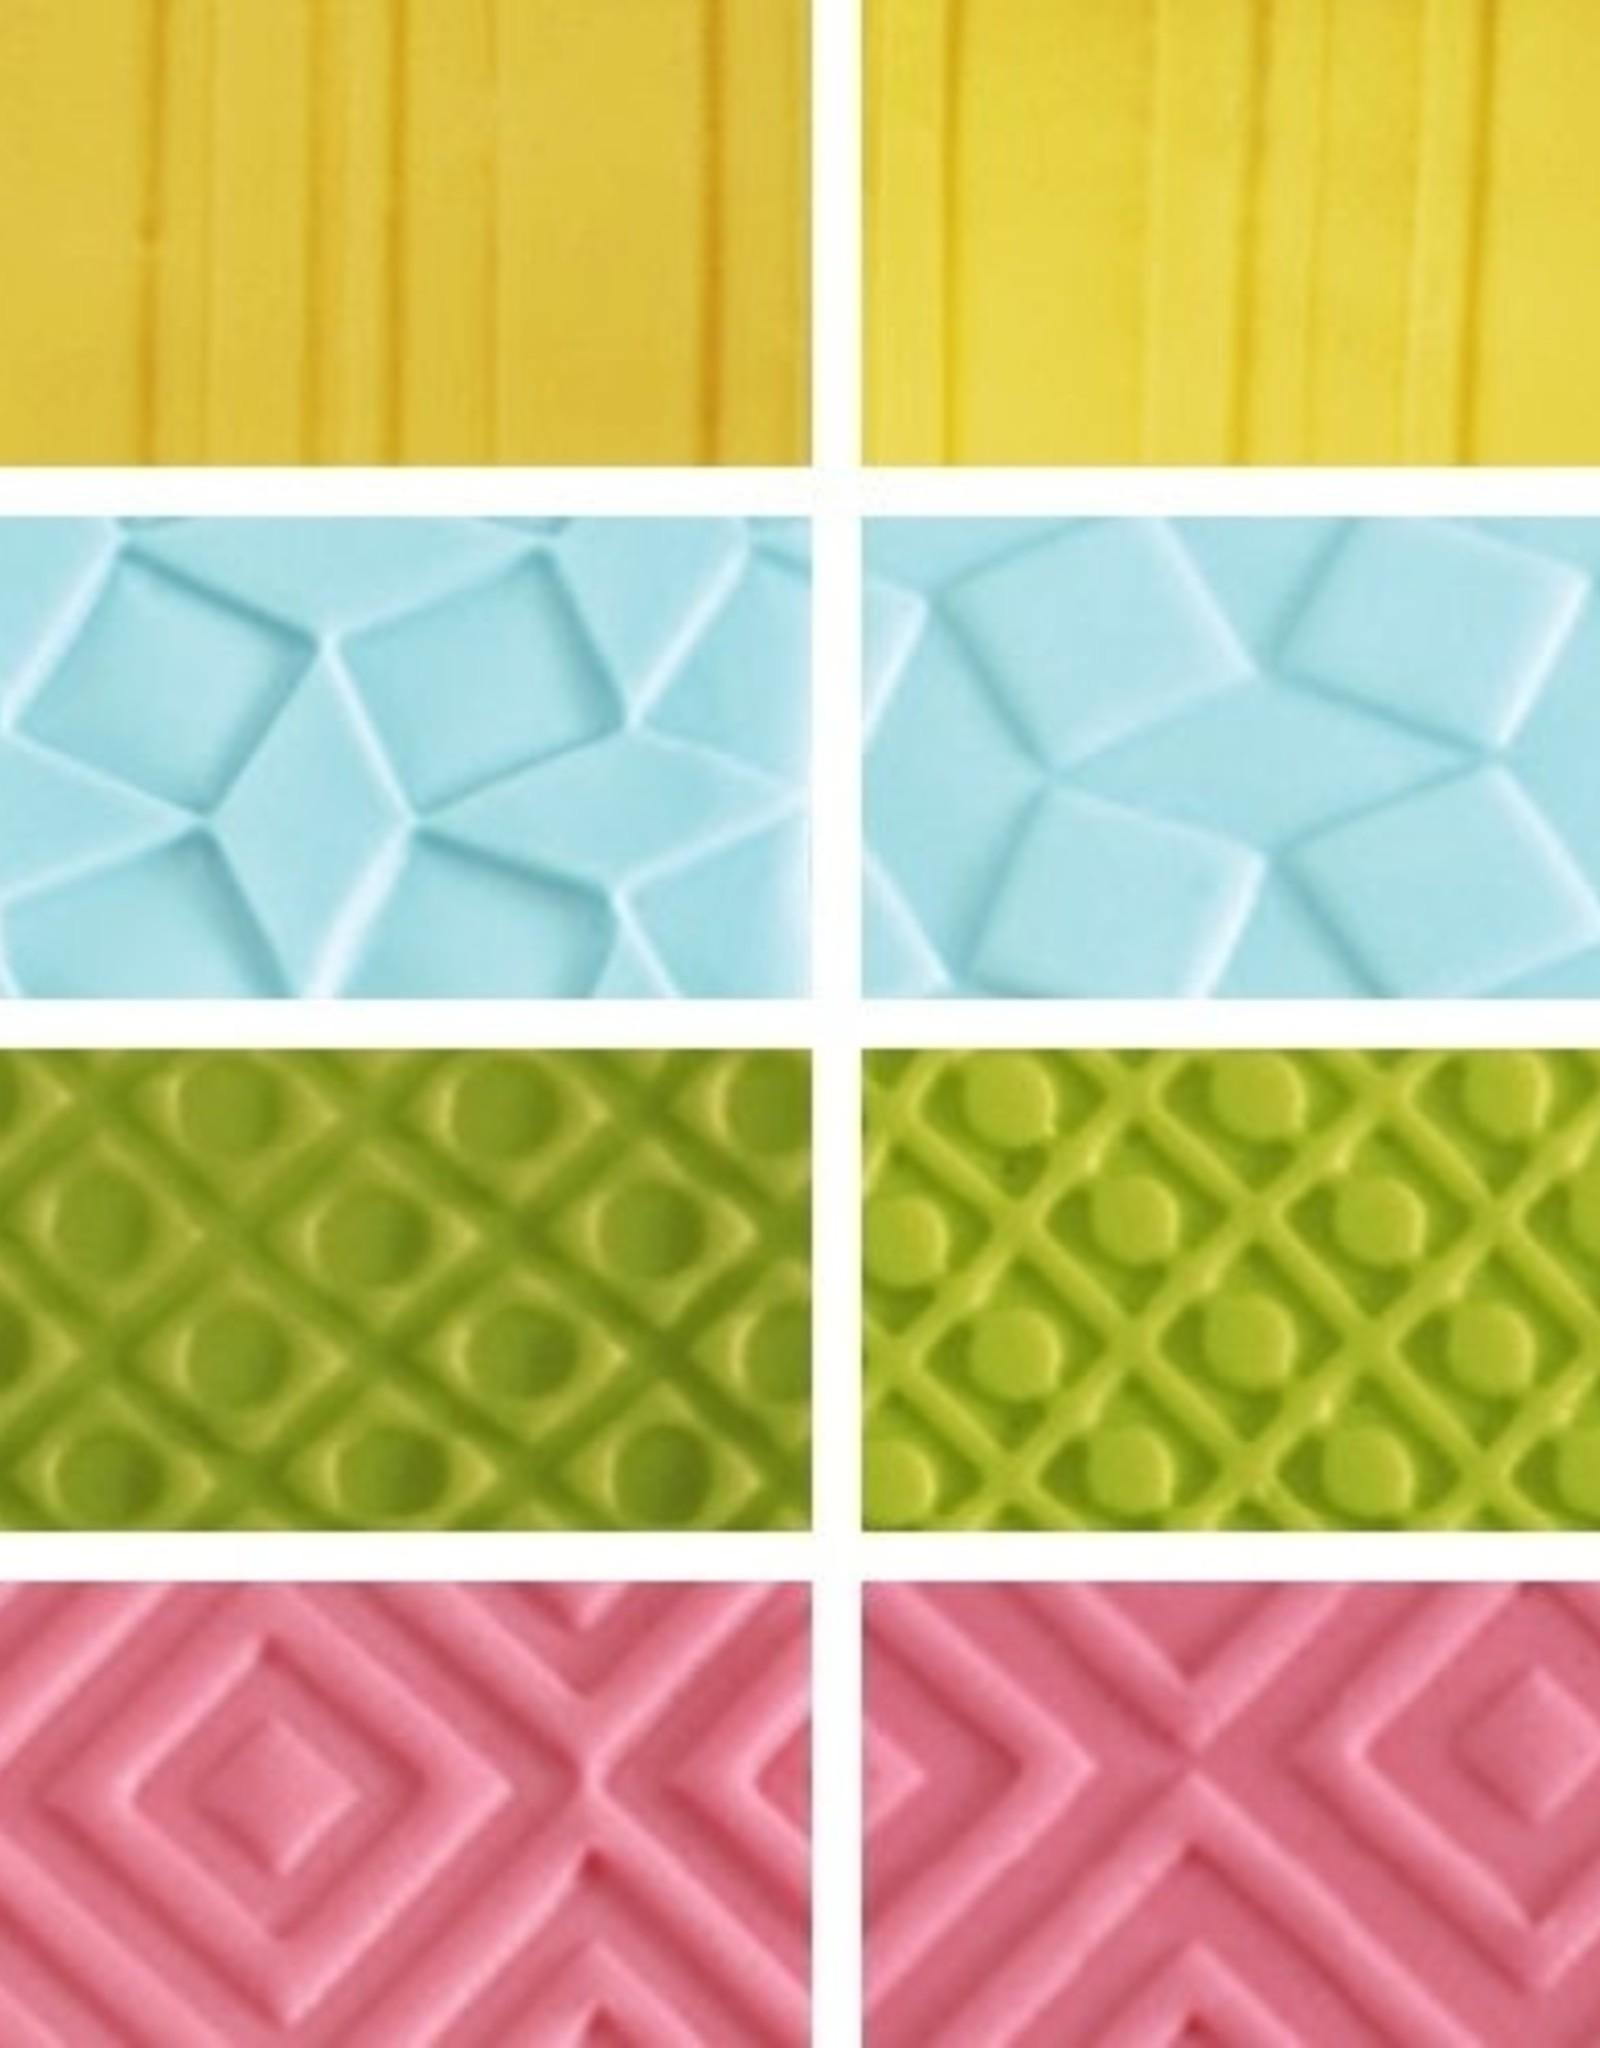 Decora Decora Decorative Sheets Set/4 Geometric Effect